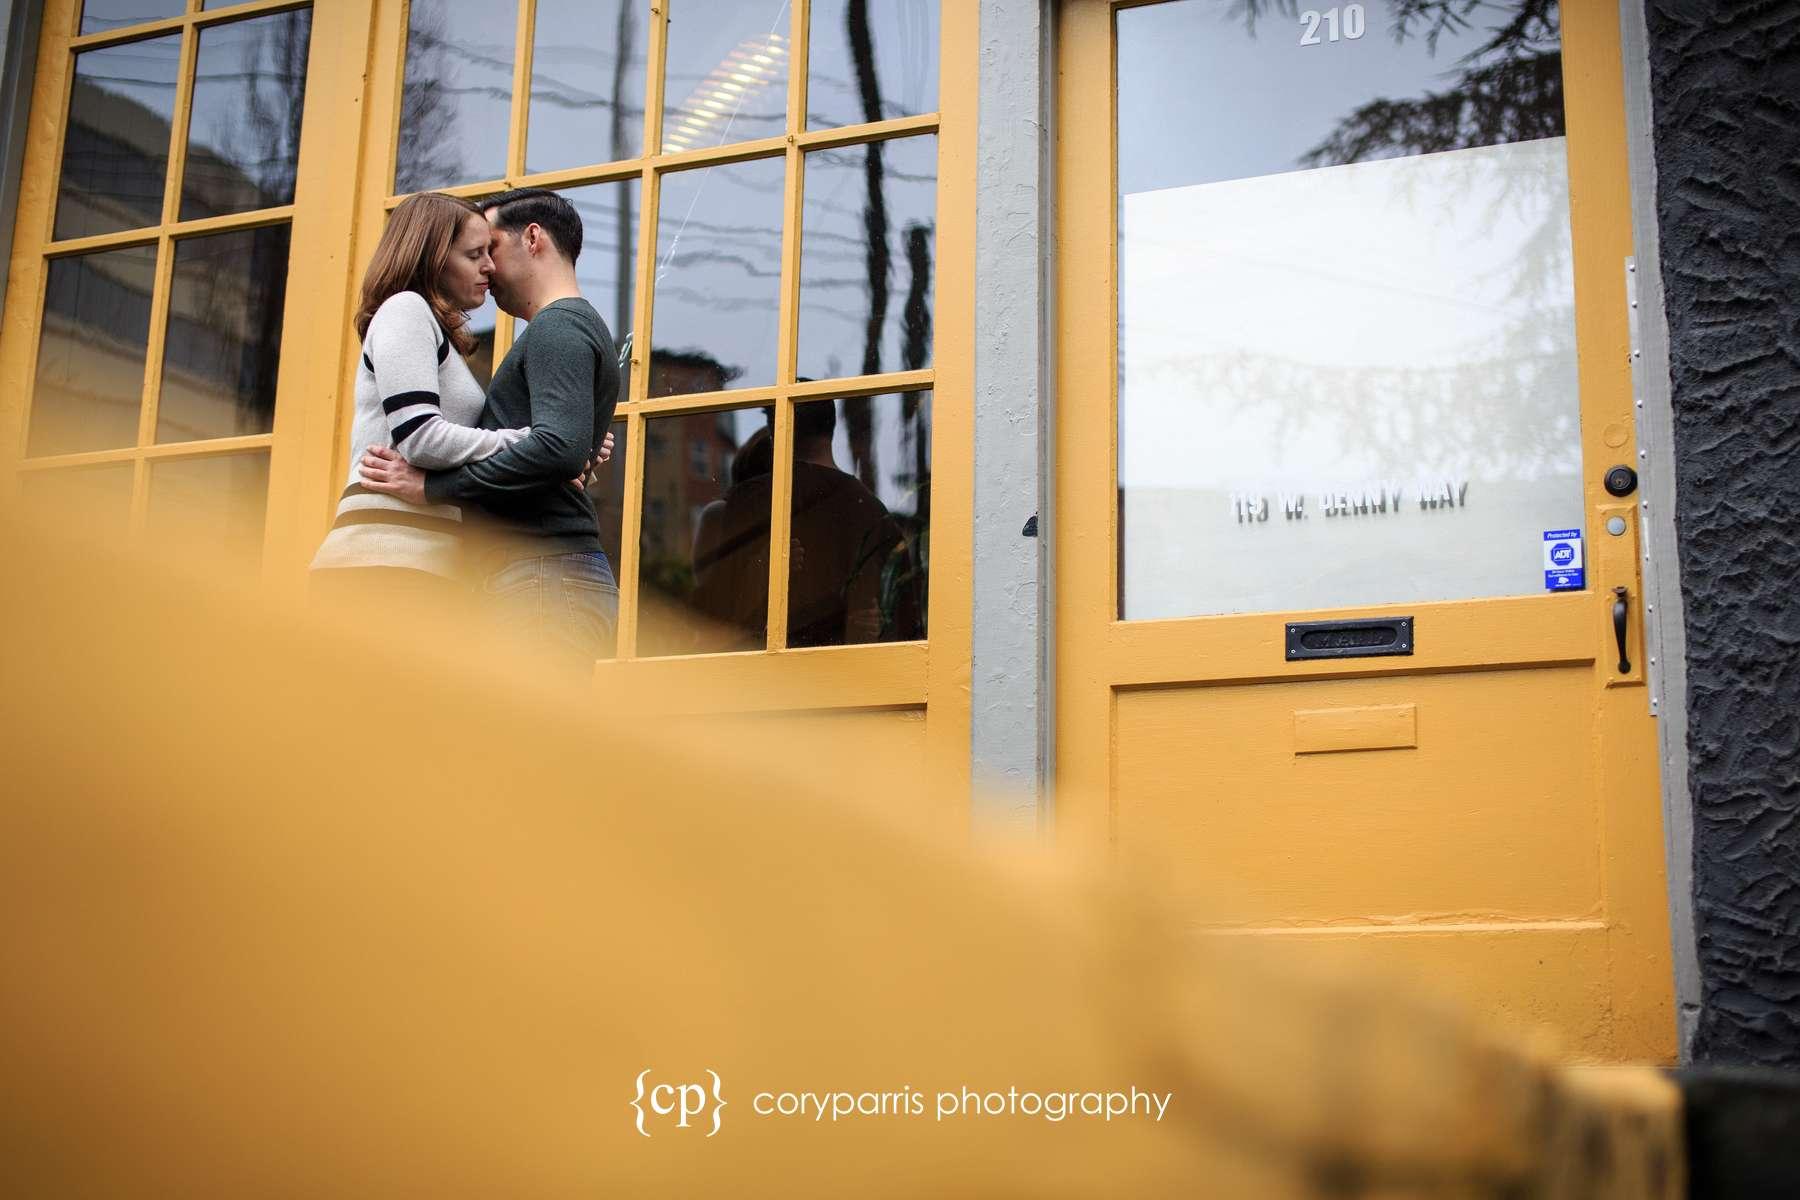 Romantic engagement portrait in Seattle with yellow door